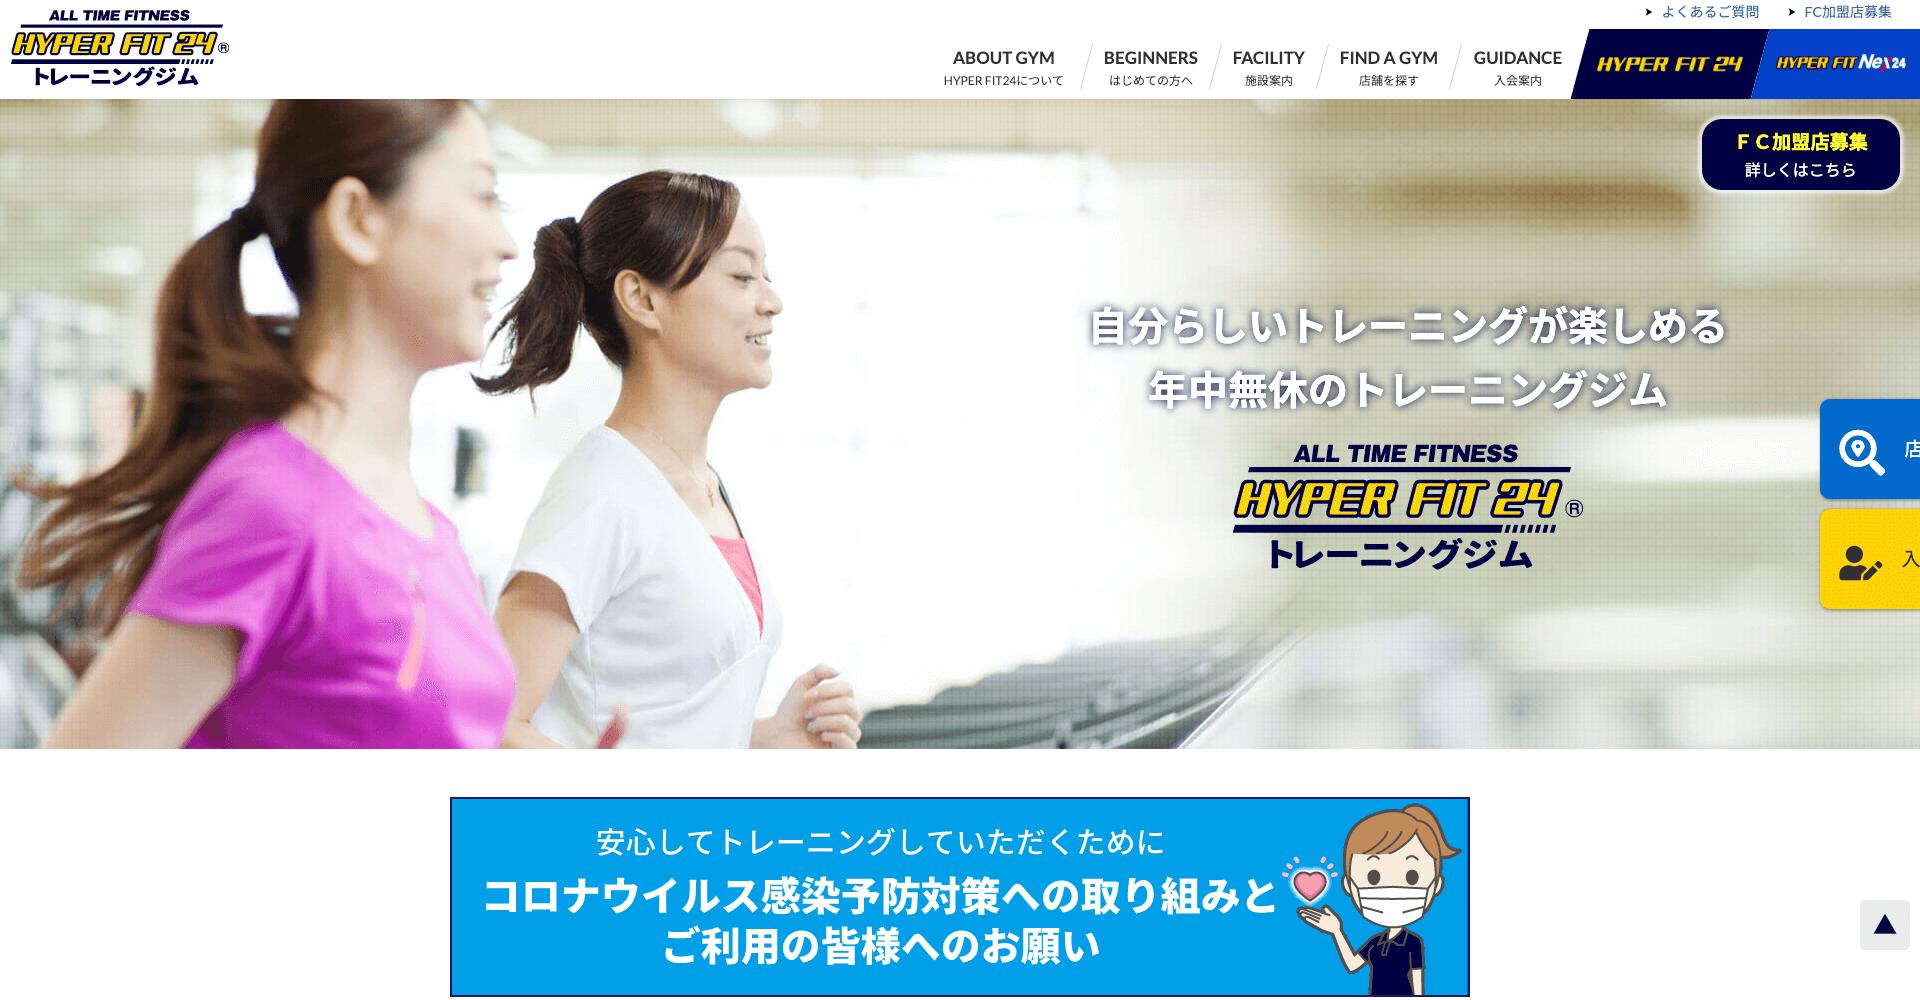 HYPER FIT 24浜松東若林店